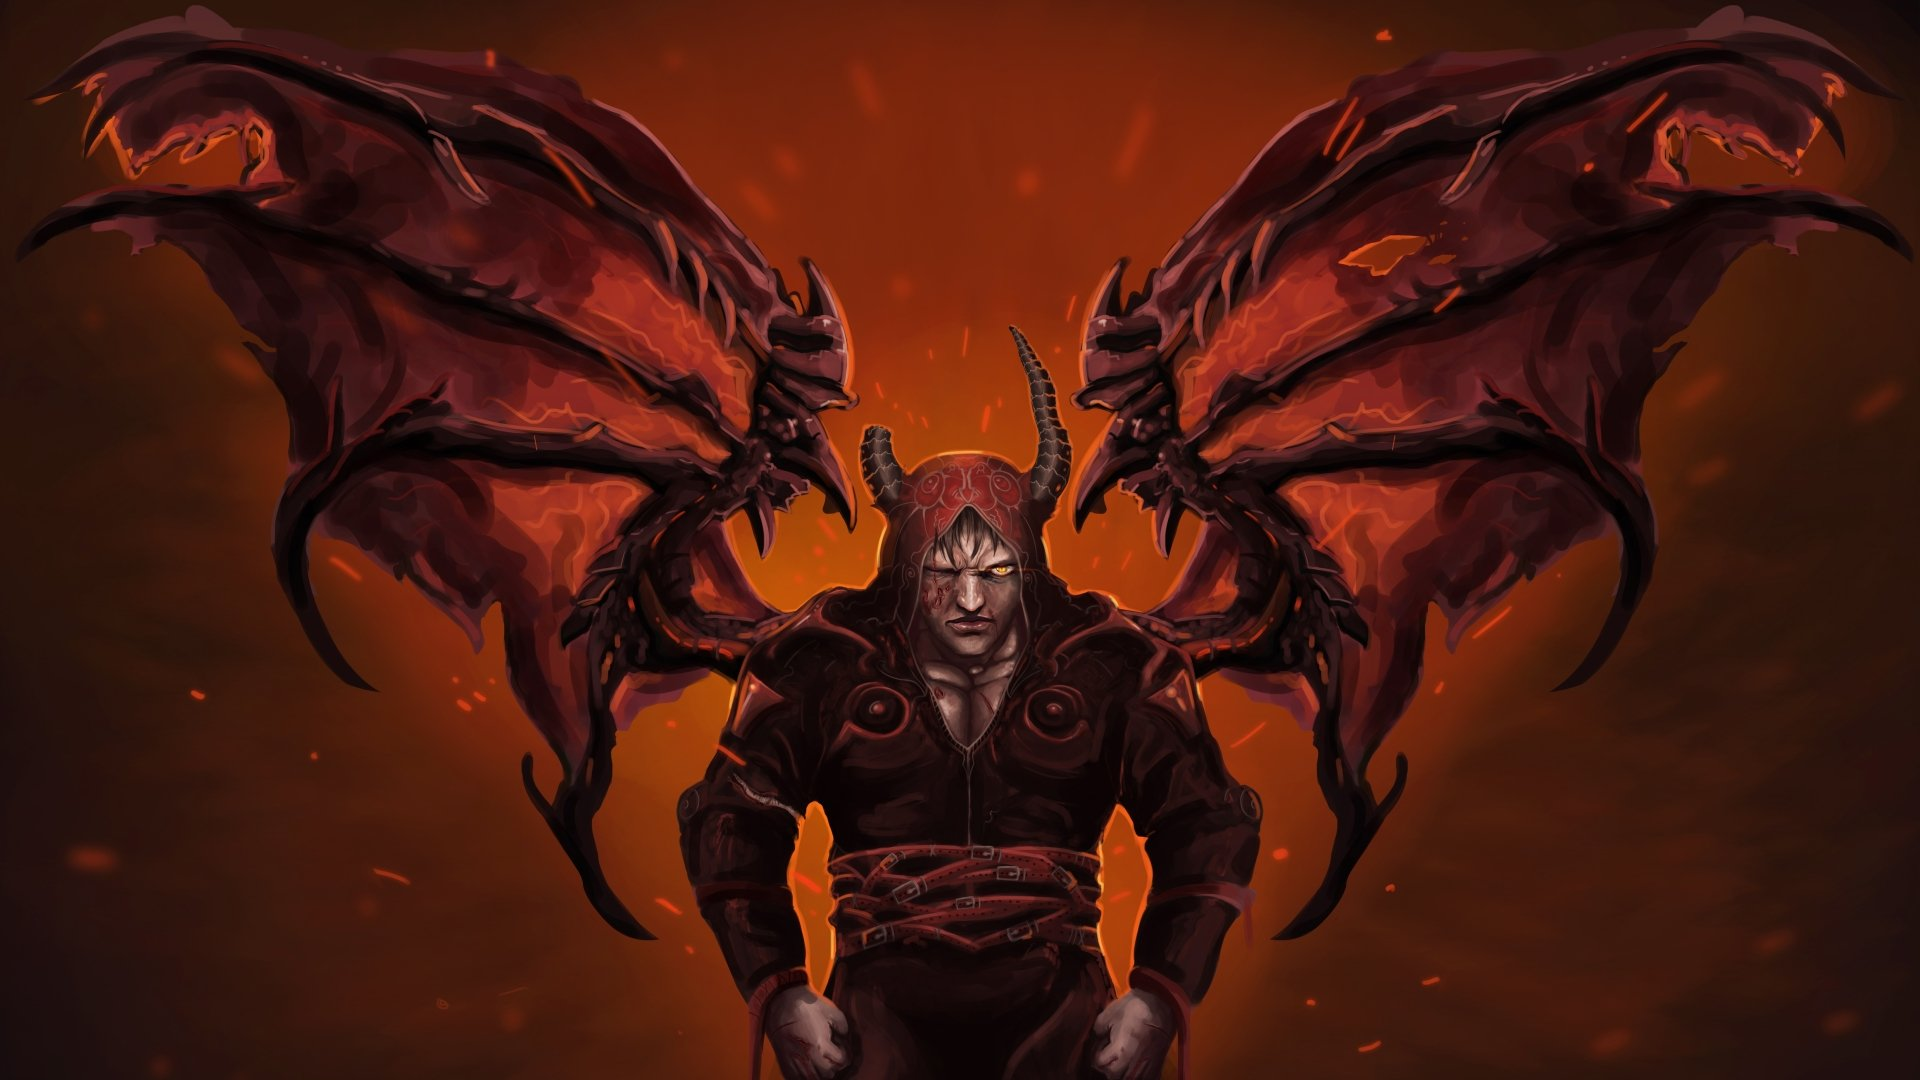 Demon 4k ultra hd wallpaper background image 4953x2786 - Demon wallpaper 4k ...